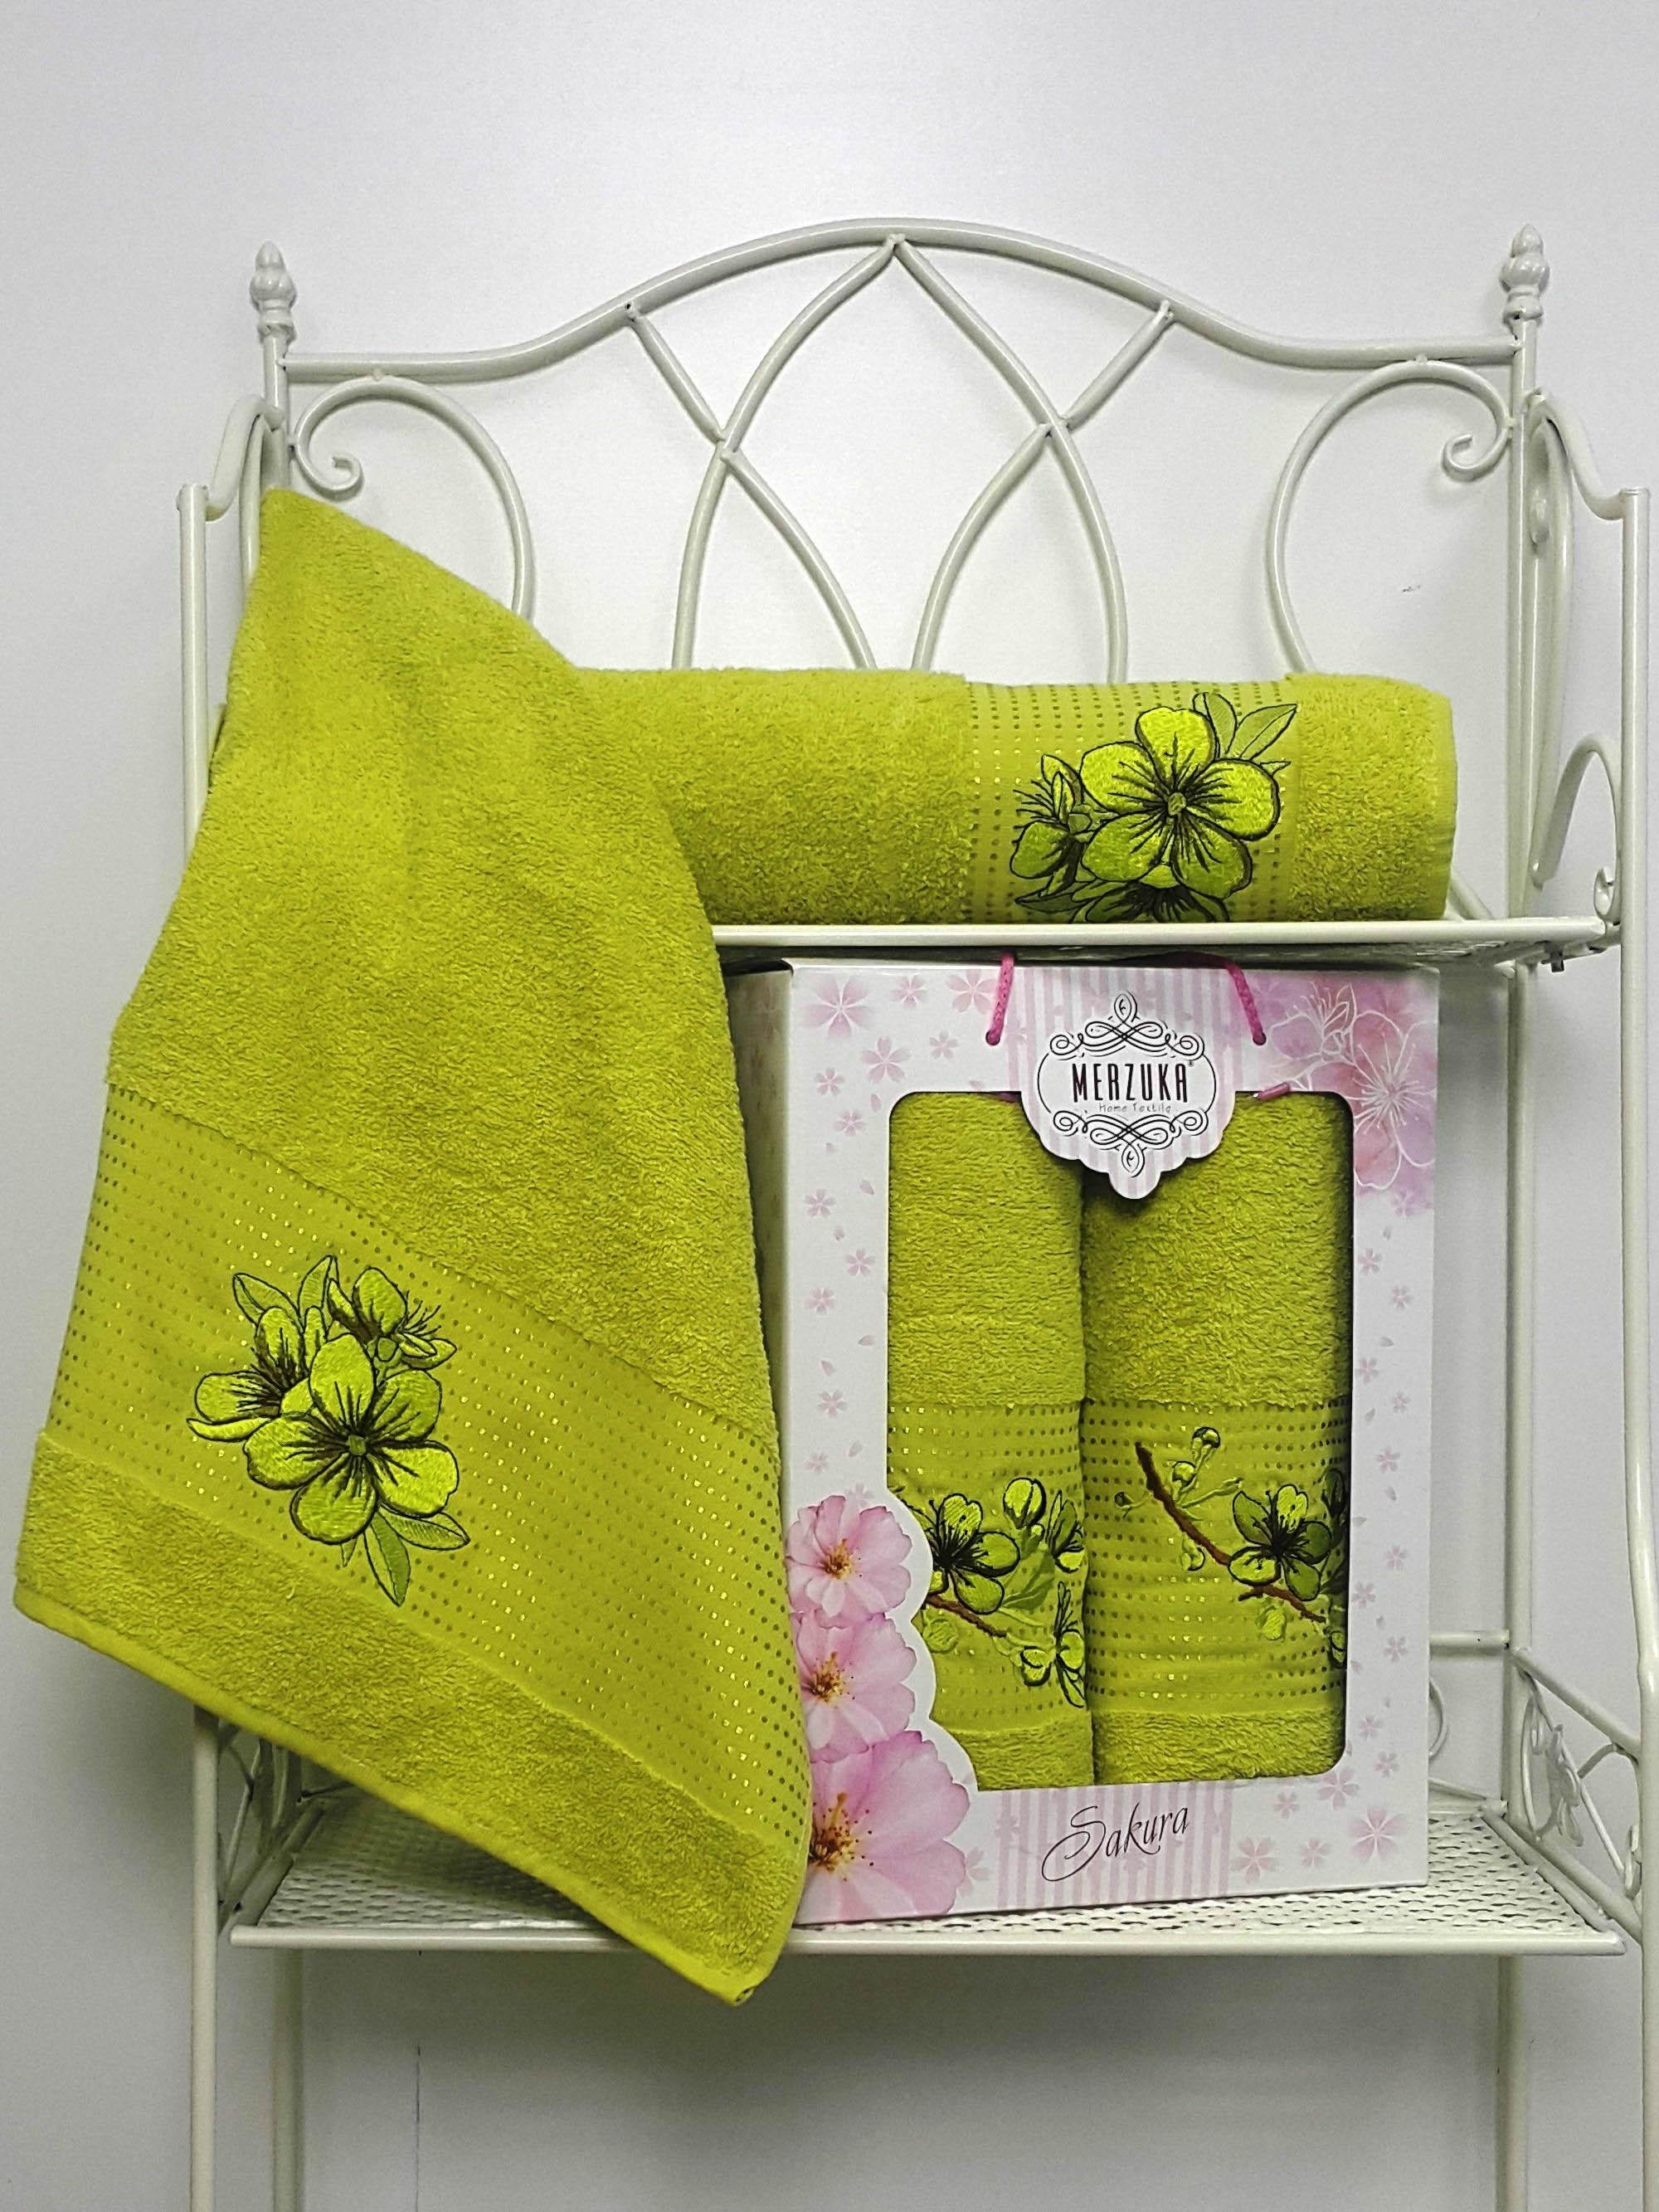 Полотенца Oran Merzuka Полотенце Sakura Цвет: Зелёный (Набор) набор из 3 полотенец merzuka sakura 50х90 2 70х140 8432 терракотовый